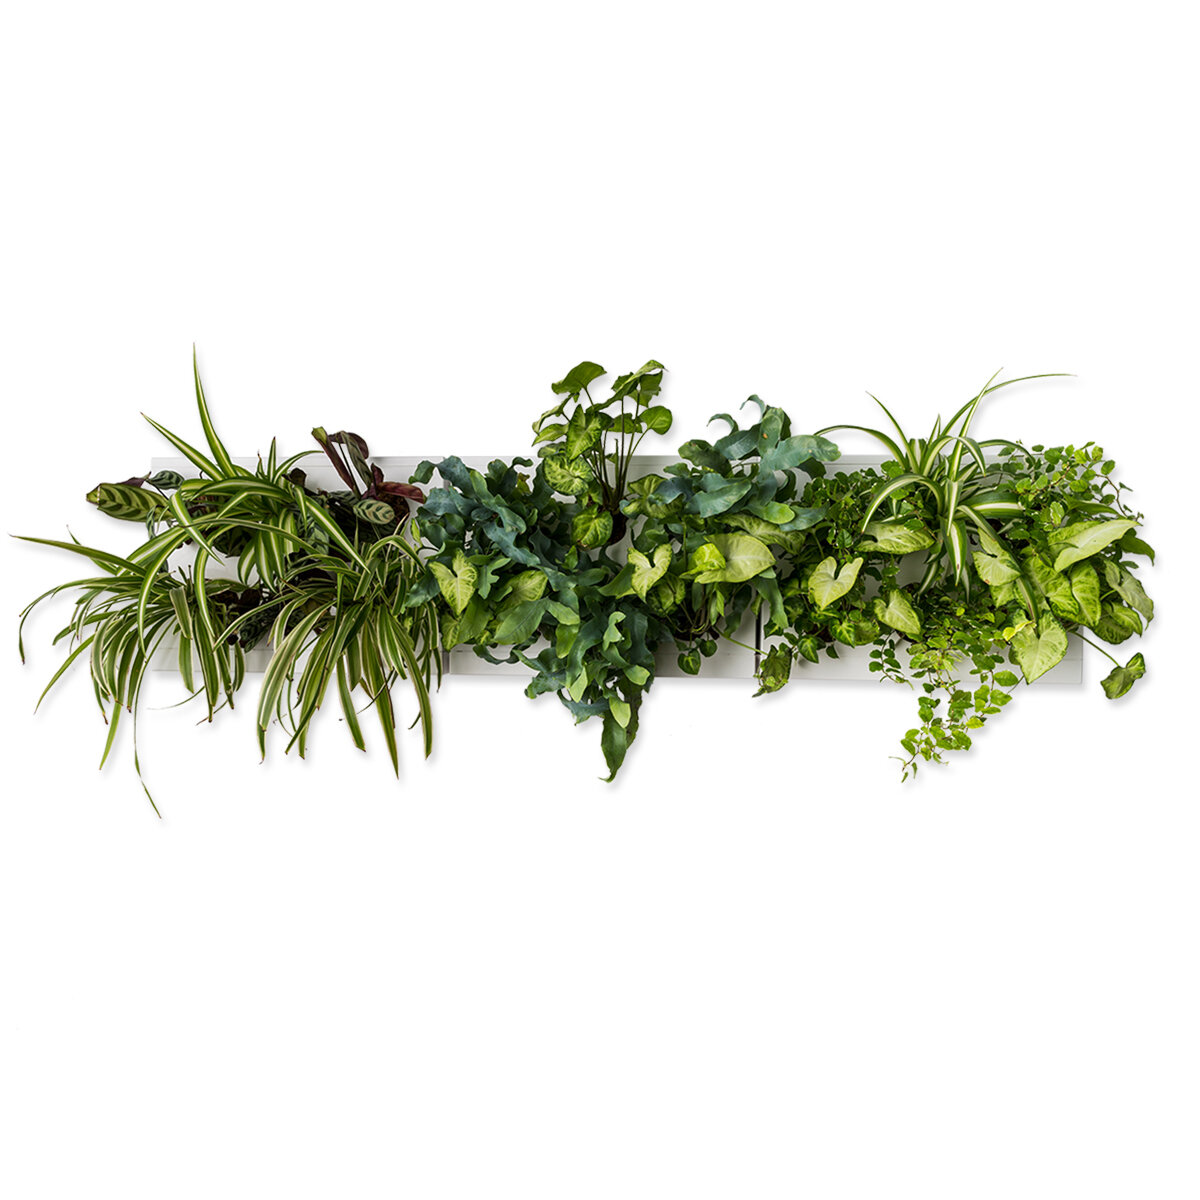 Giardini Verticali Fai Da Te ortisgreen | giardini verticali - hoh! trio smart bianco, composizione  quadri vegetali fai da te (diy)